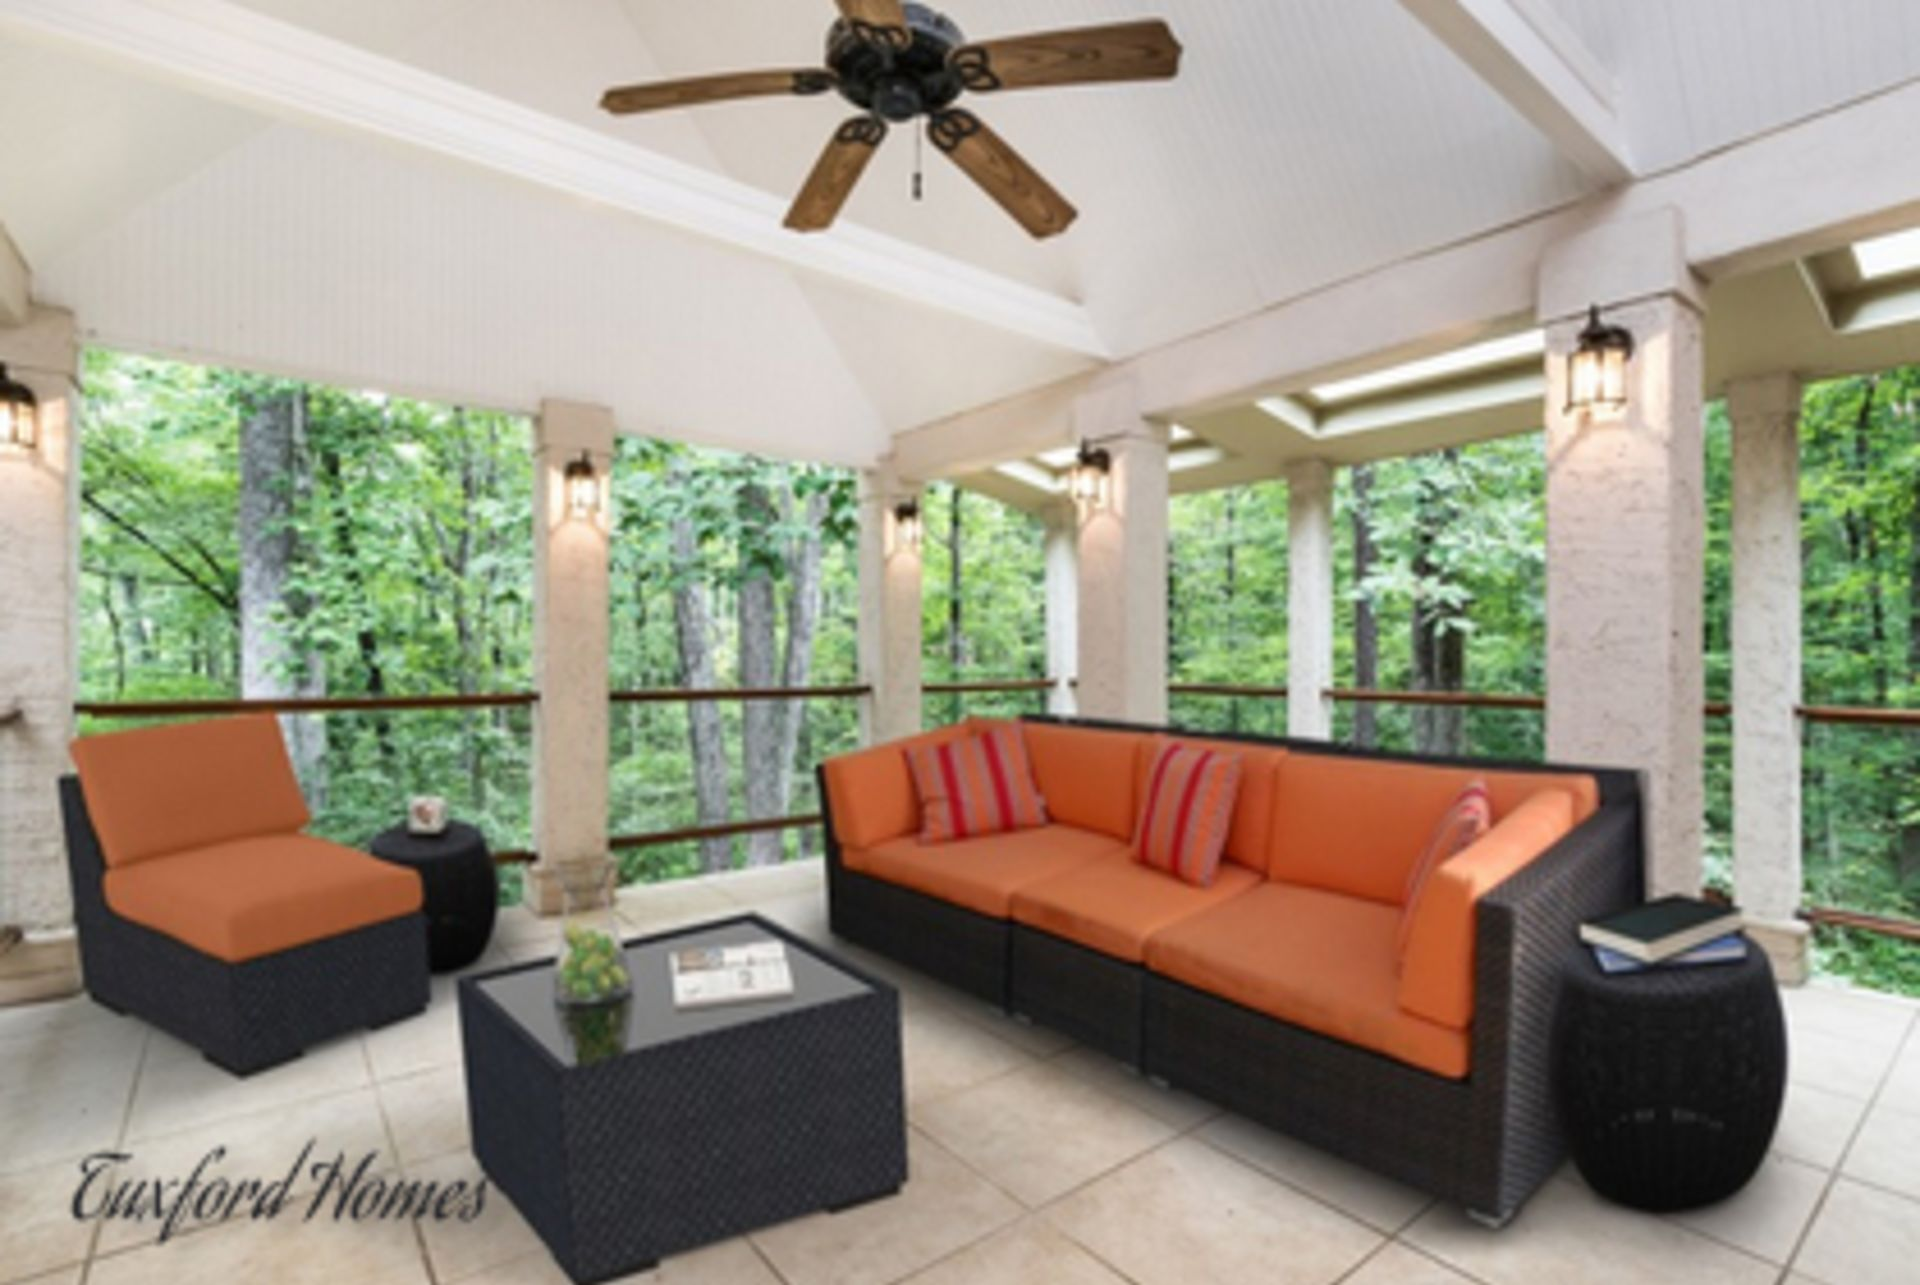 Tuxford Home Sales